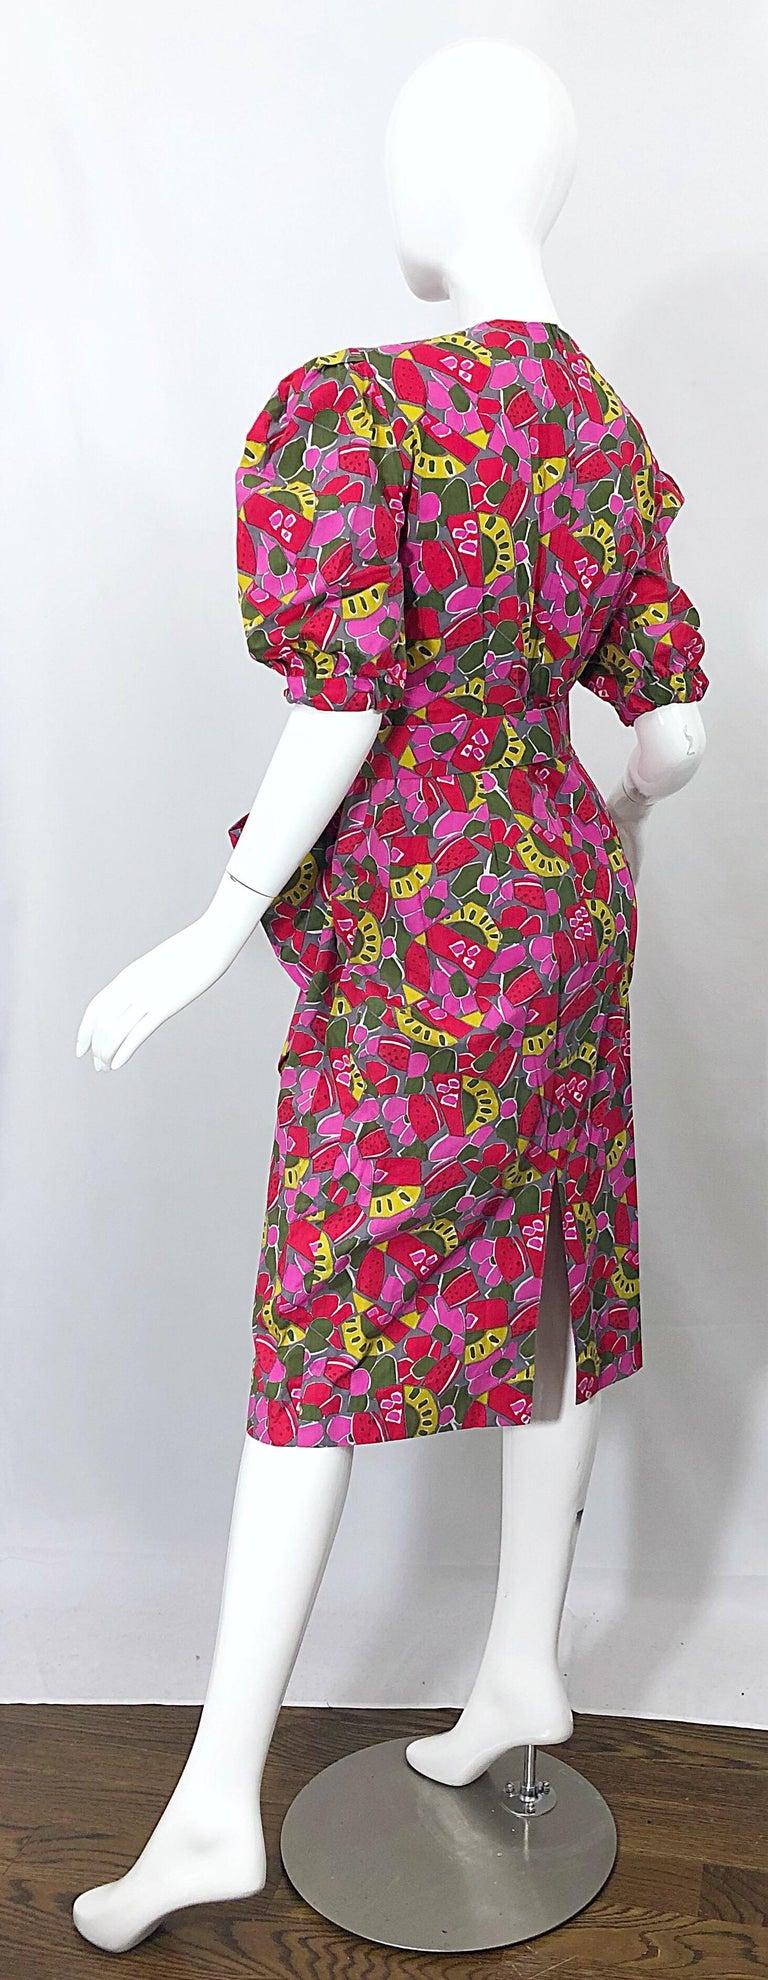 Brown 1980s Guy Laroche Size 44 / 12 Novelty Fruit Print Avant Garde Vintage 80s Dress For Sale